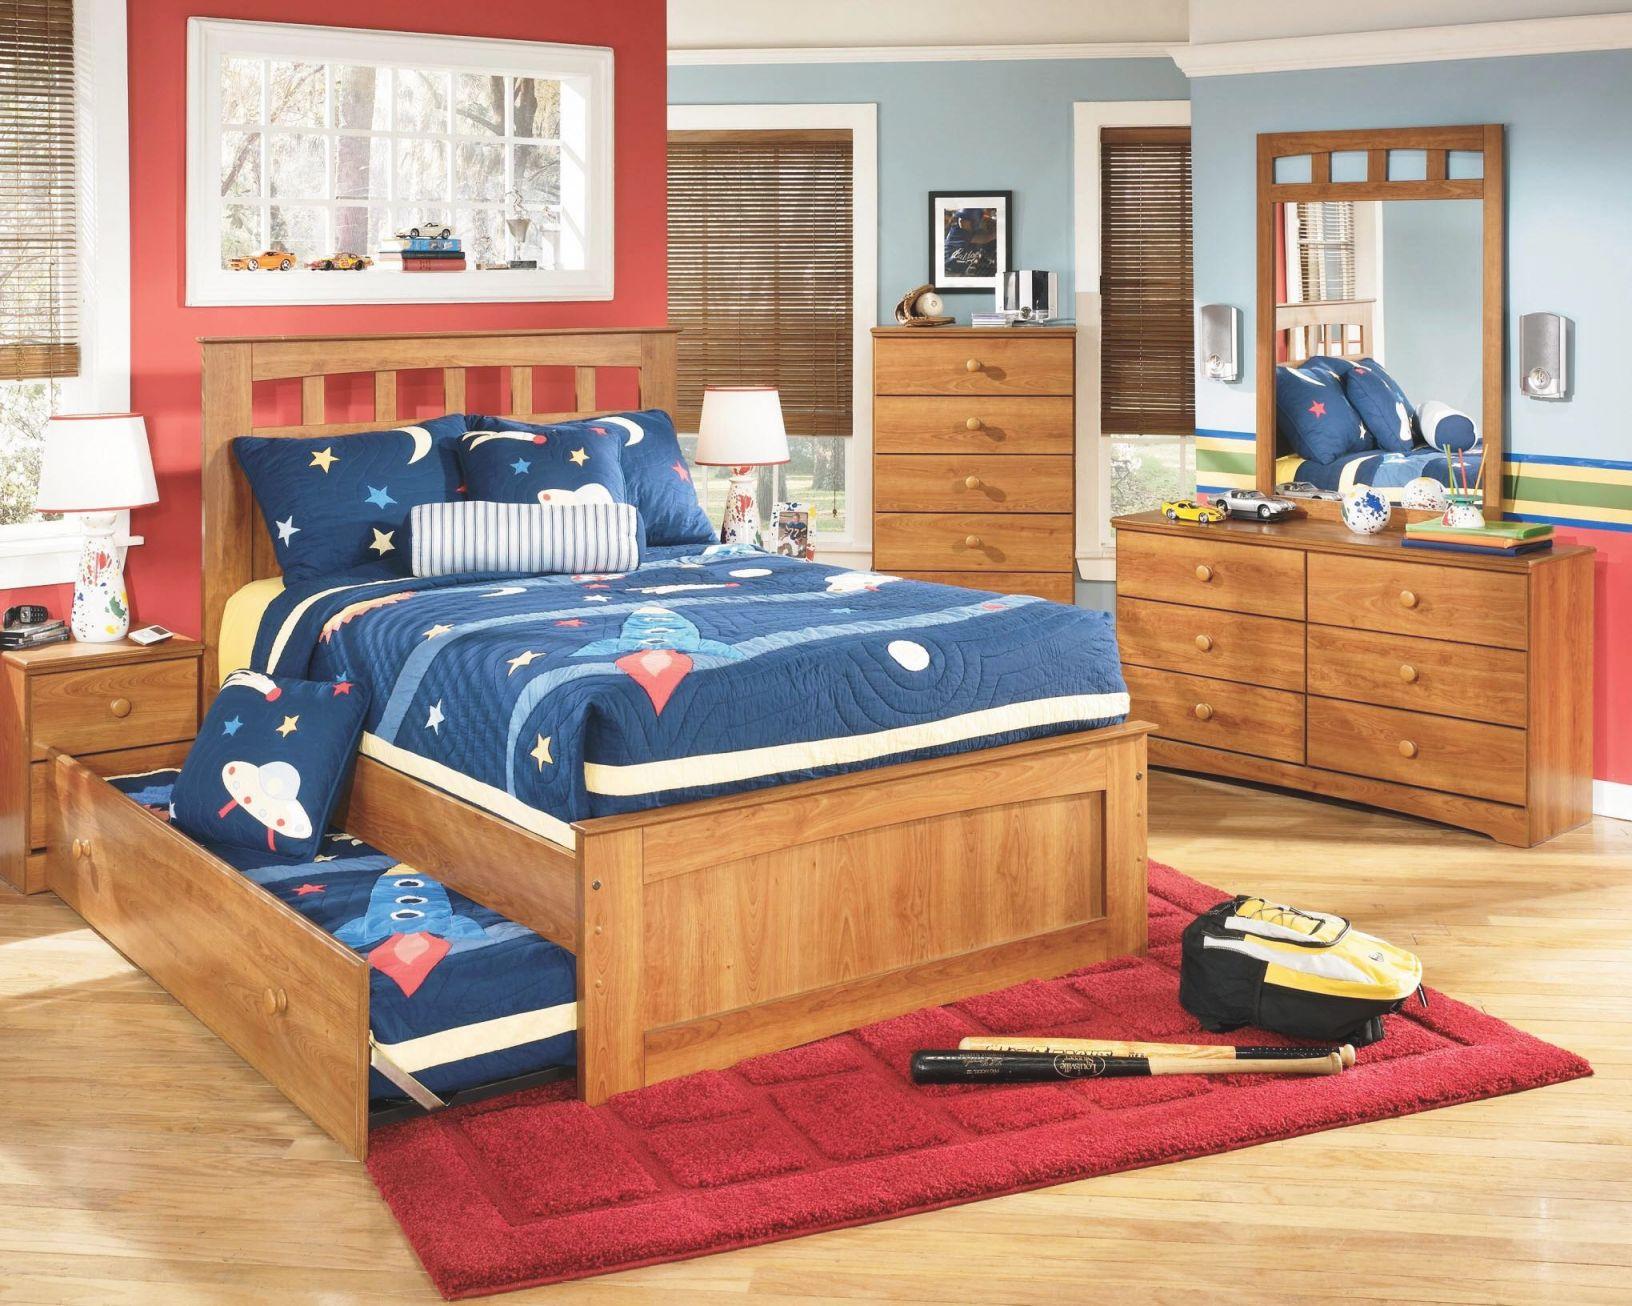 Twin Bedroom Furniture Sets For Kids Viendoraglass throughout Lovely Boys Bedroom Furniture Sets